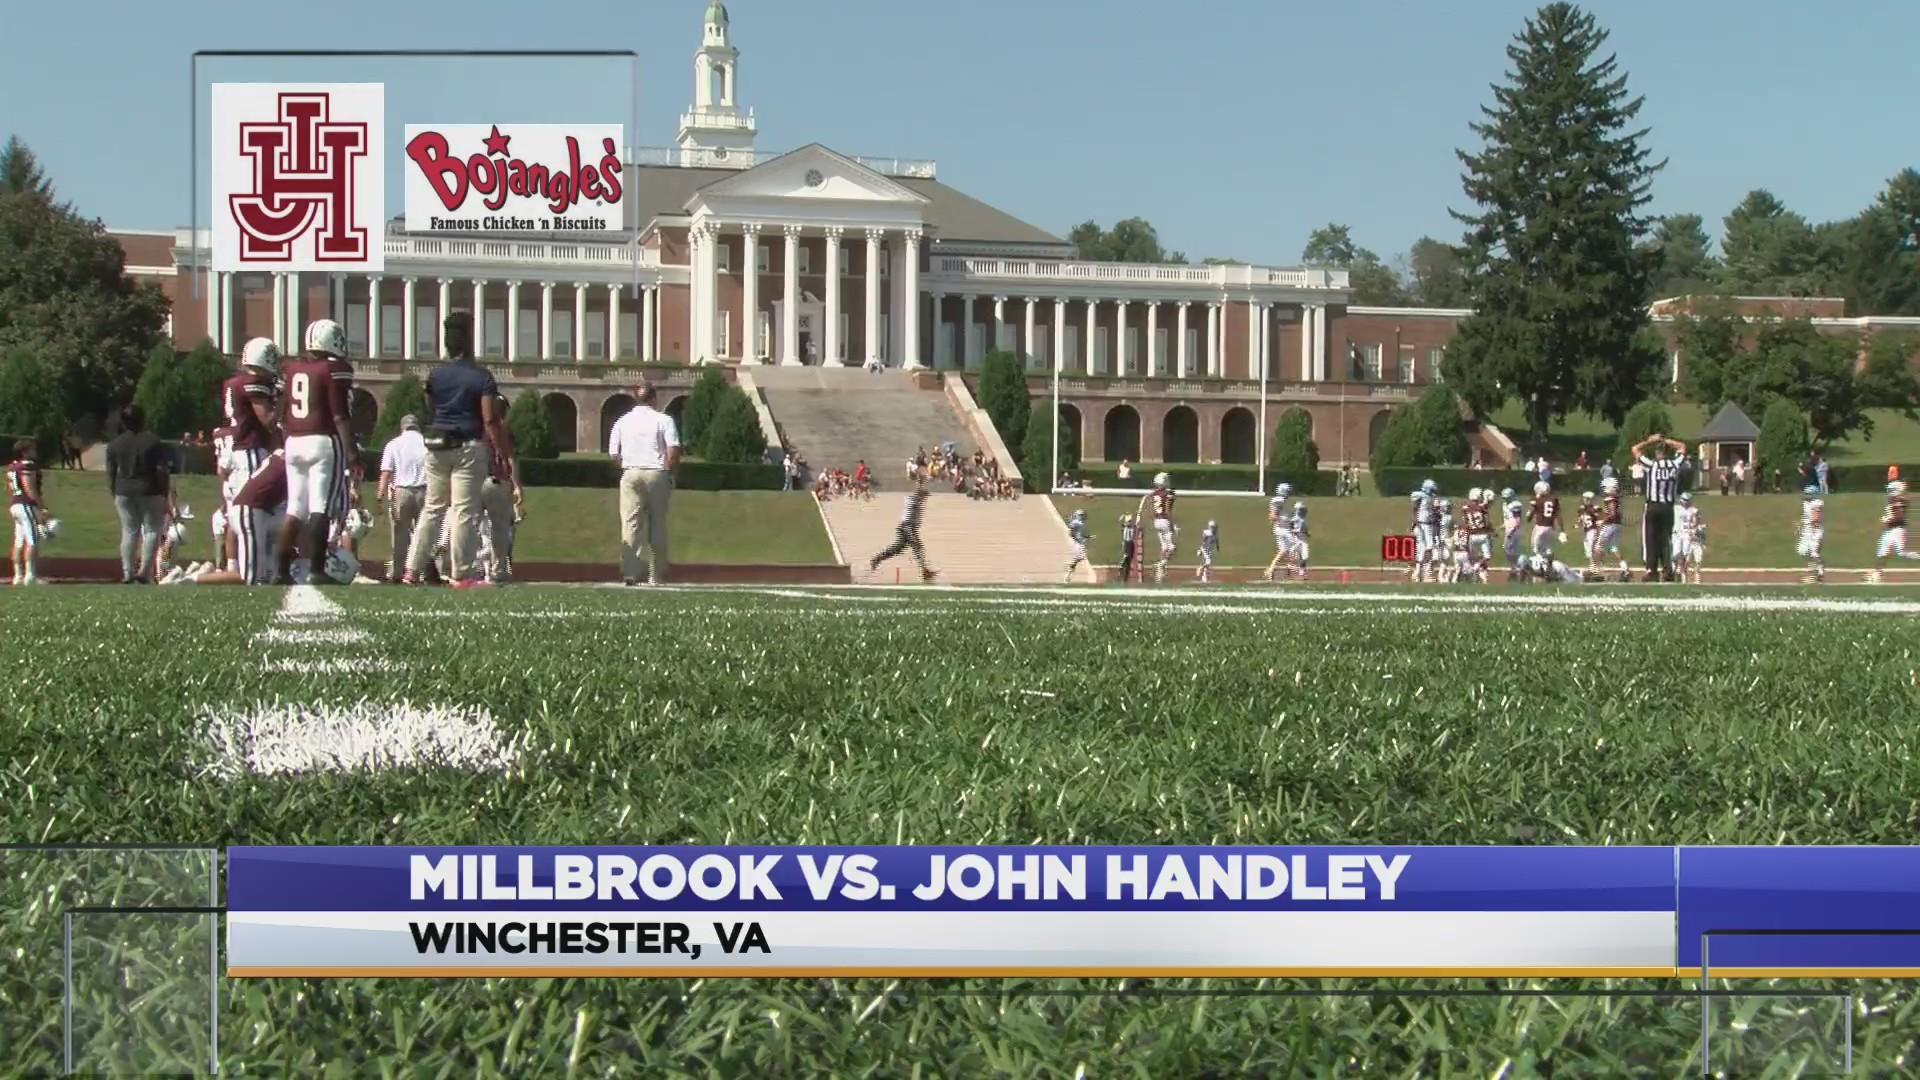 Millbrook_vs__John_Handley_0_20181006234337